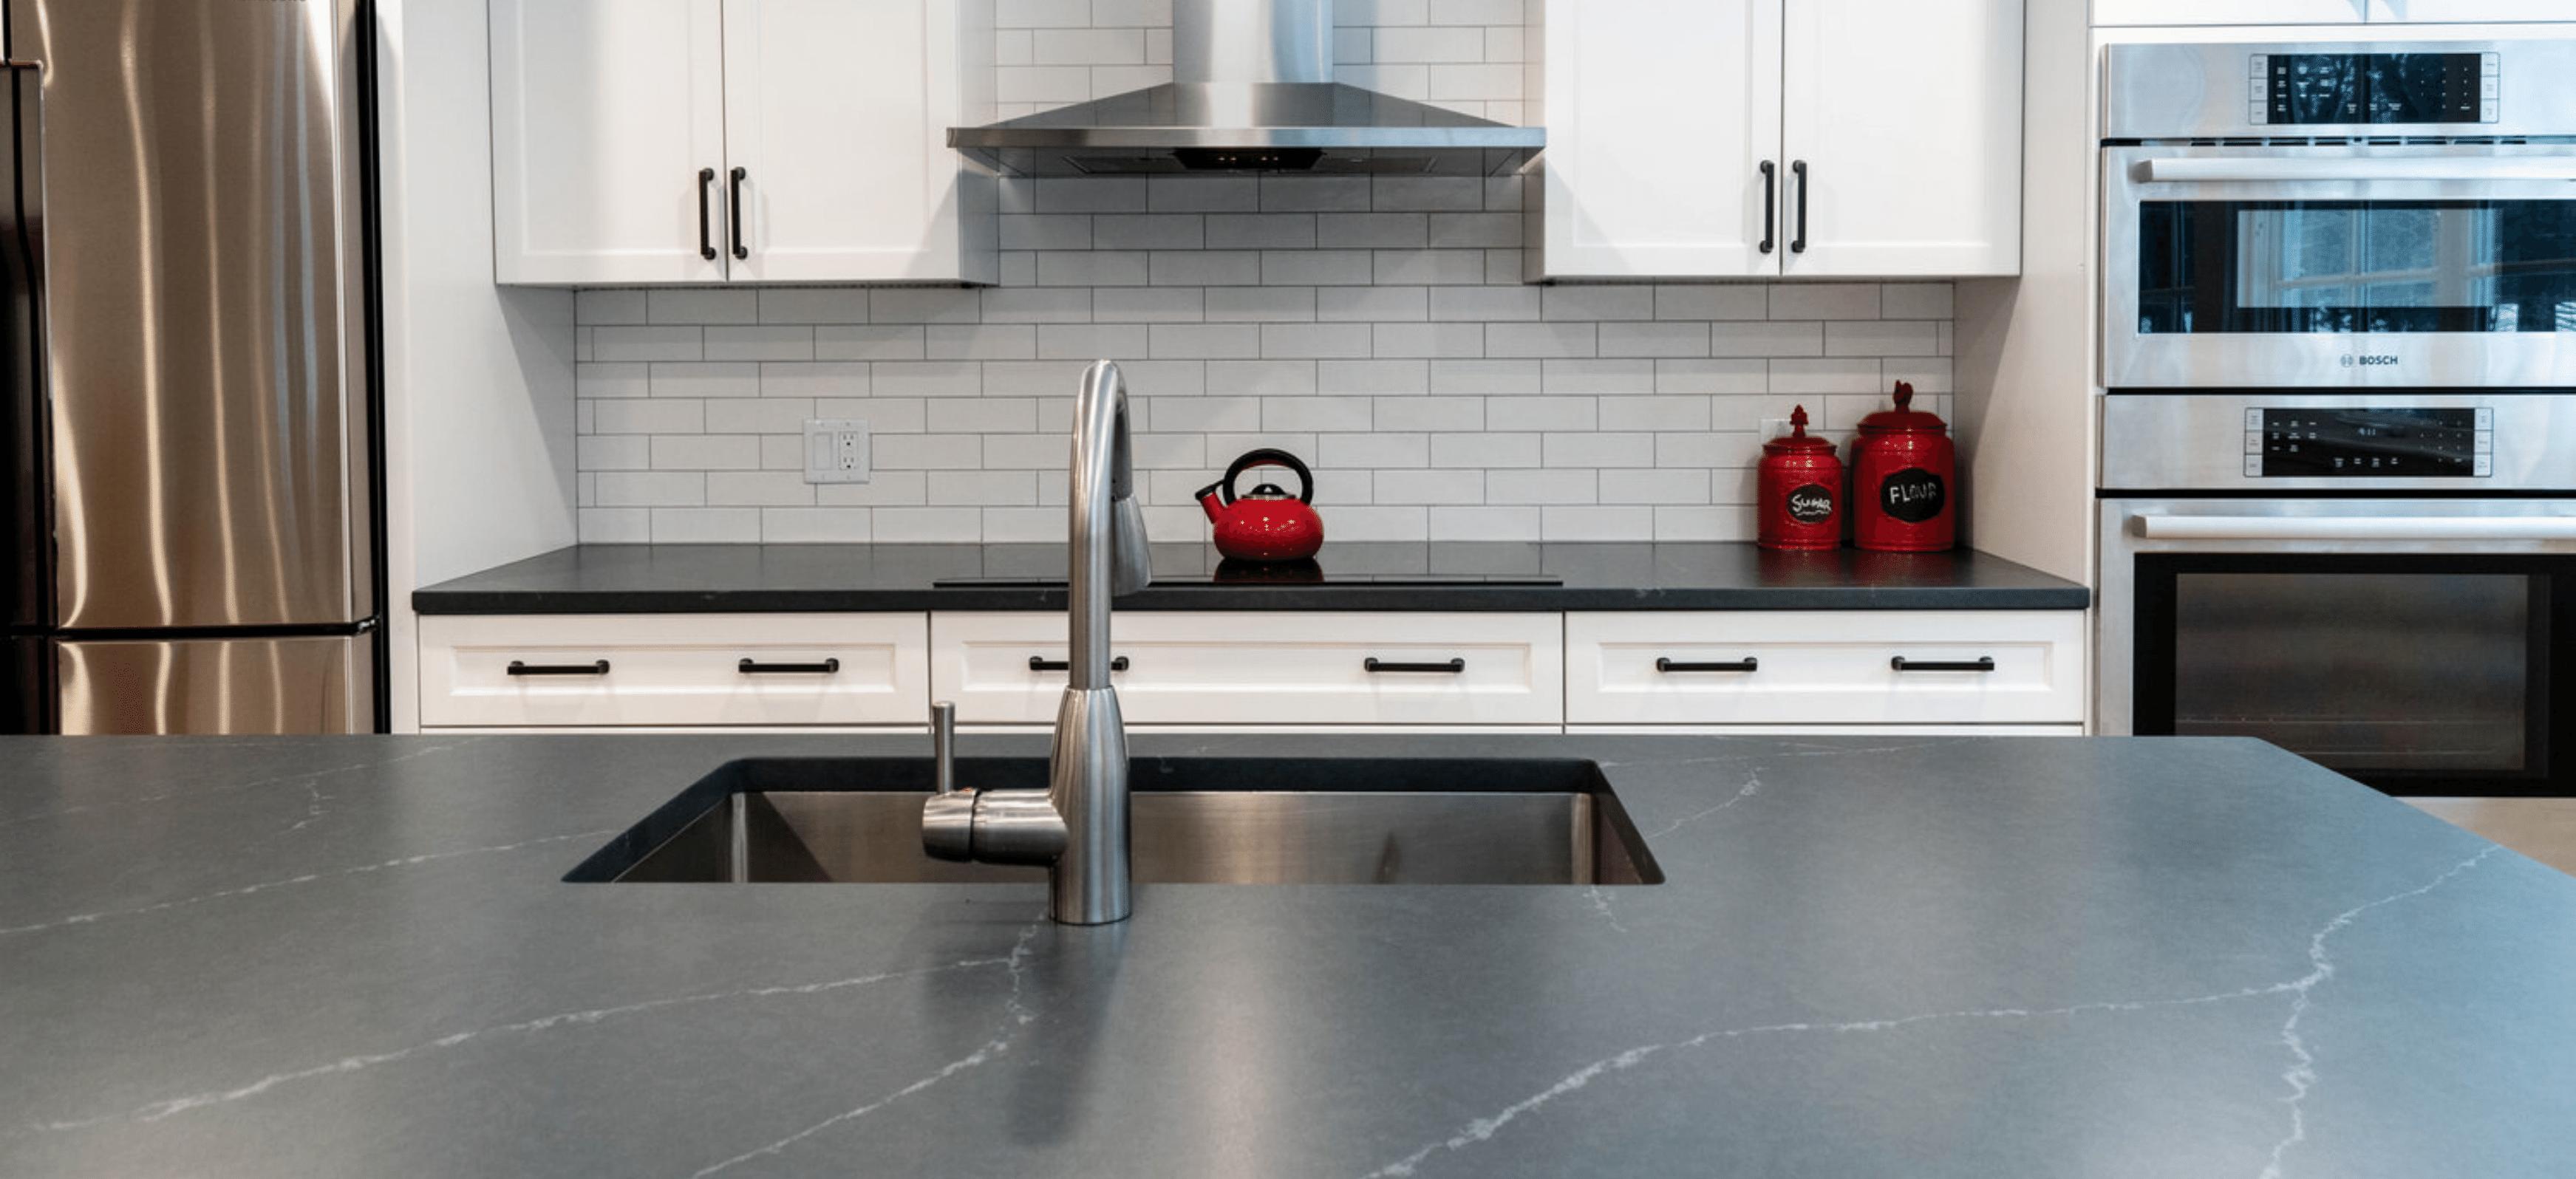 Charcoal Soapstone Kitchen Countertops and Island with White Subway Tile Backsplash Natural Stone Countertops